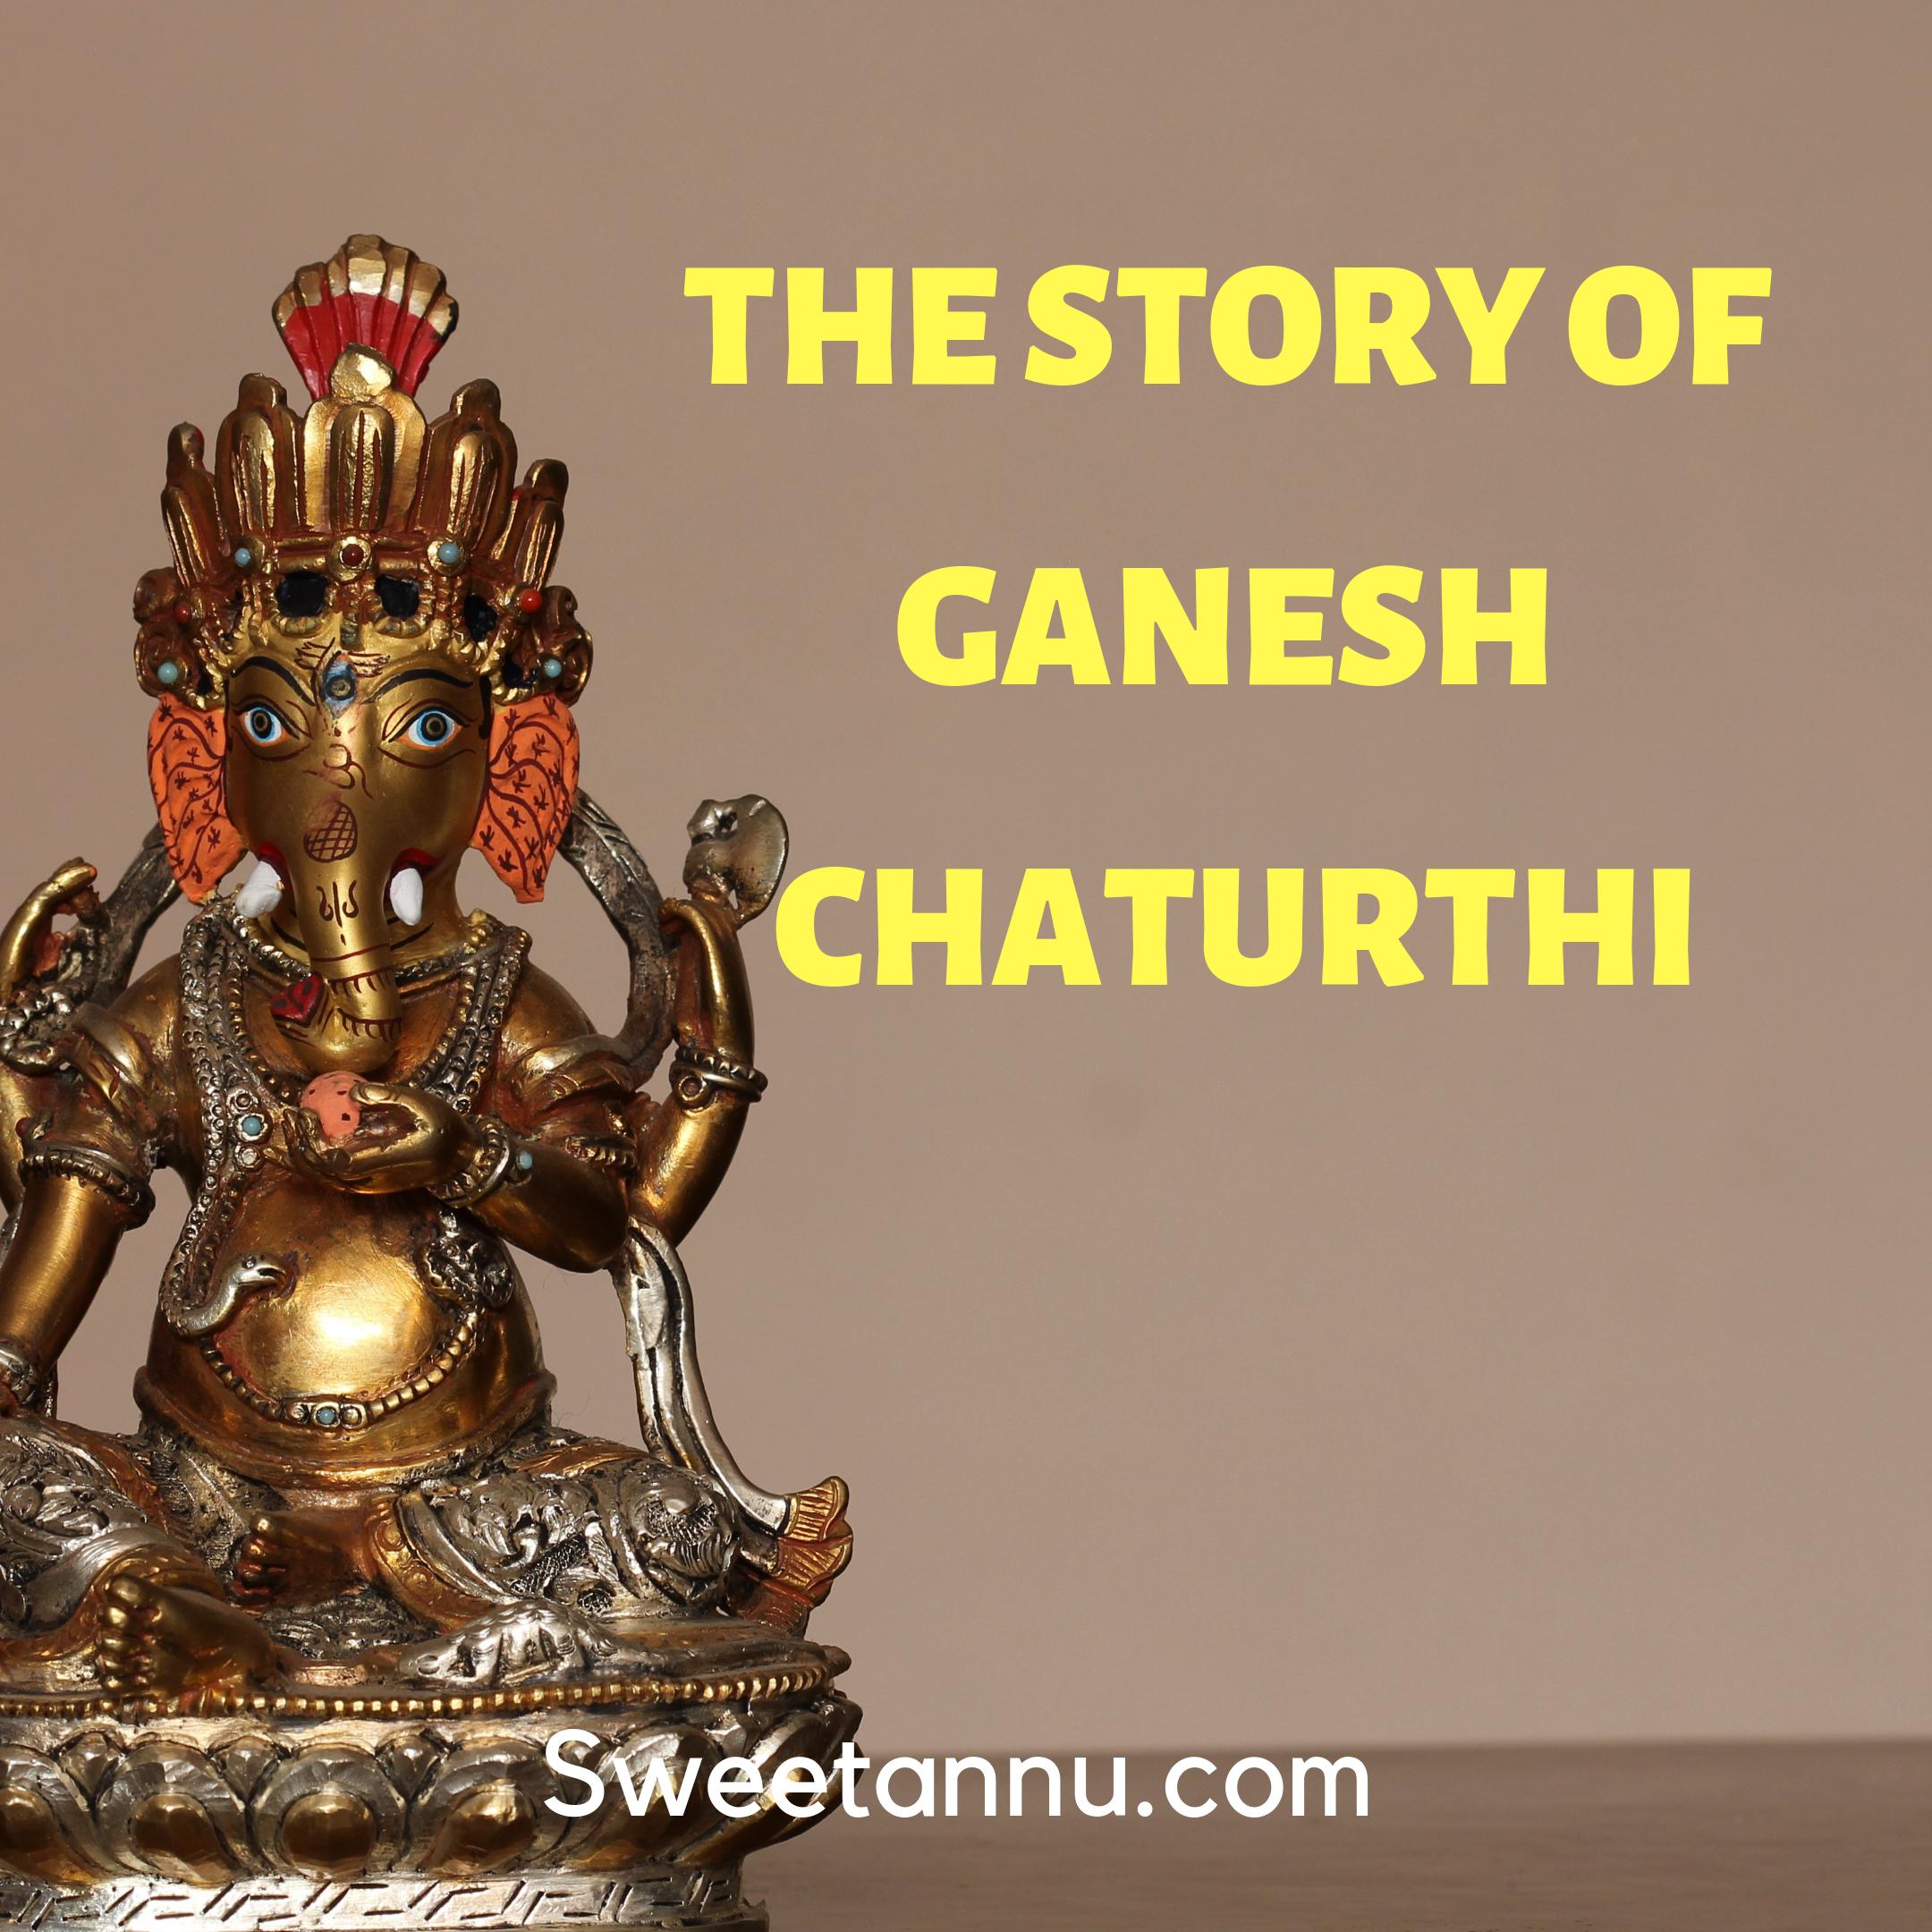 The story of Ganesh Chaturthi